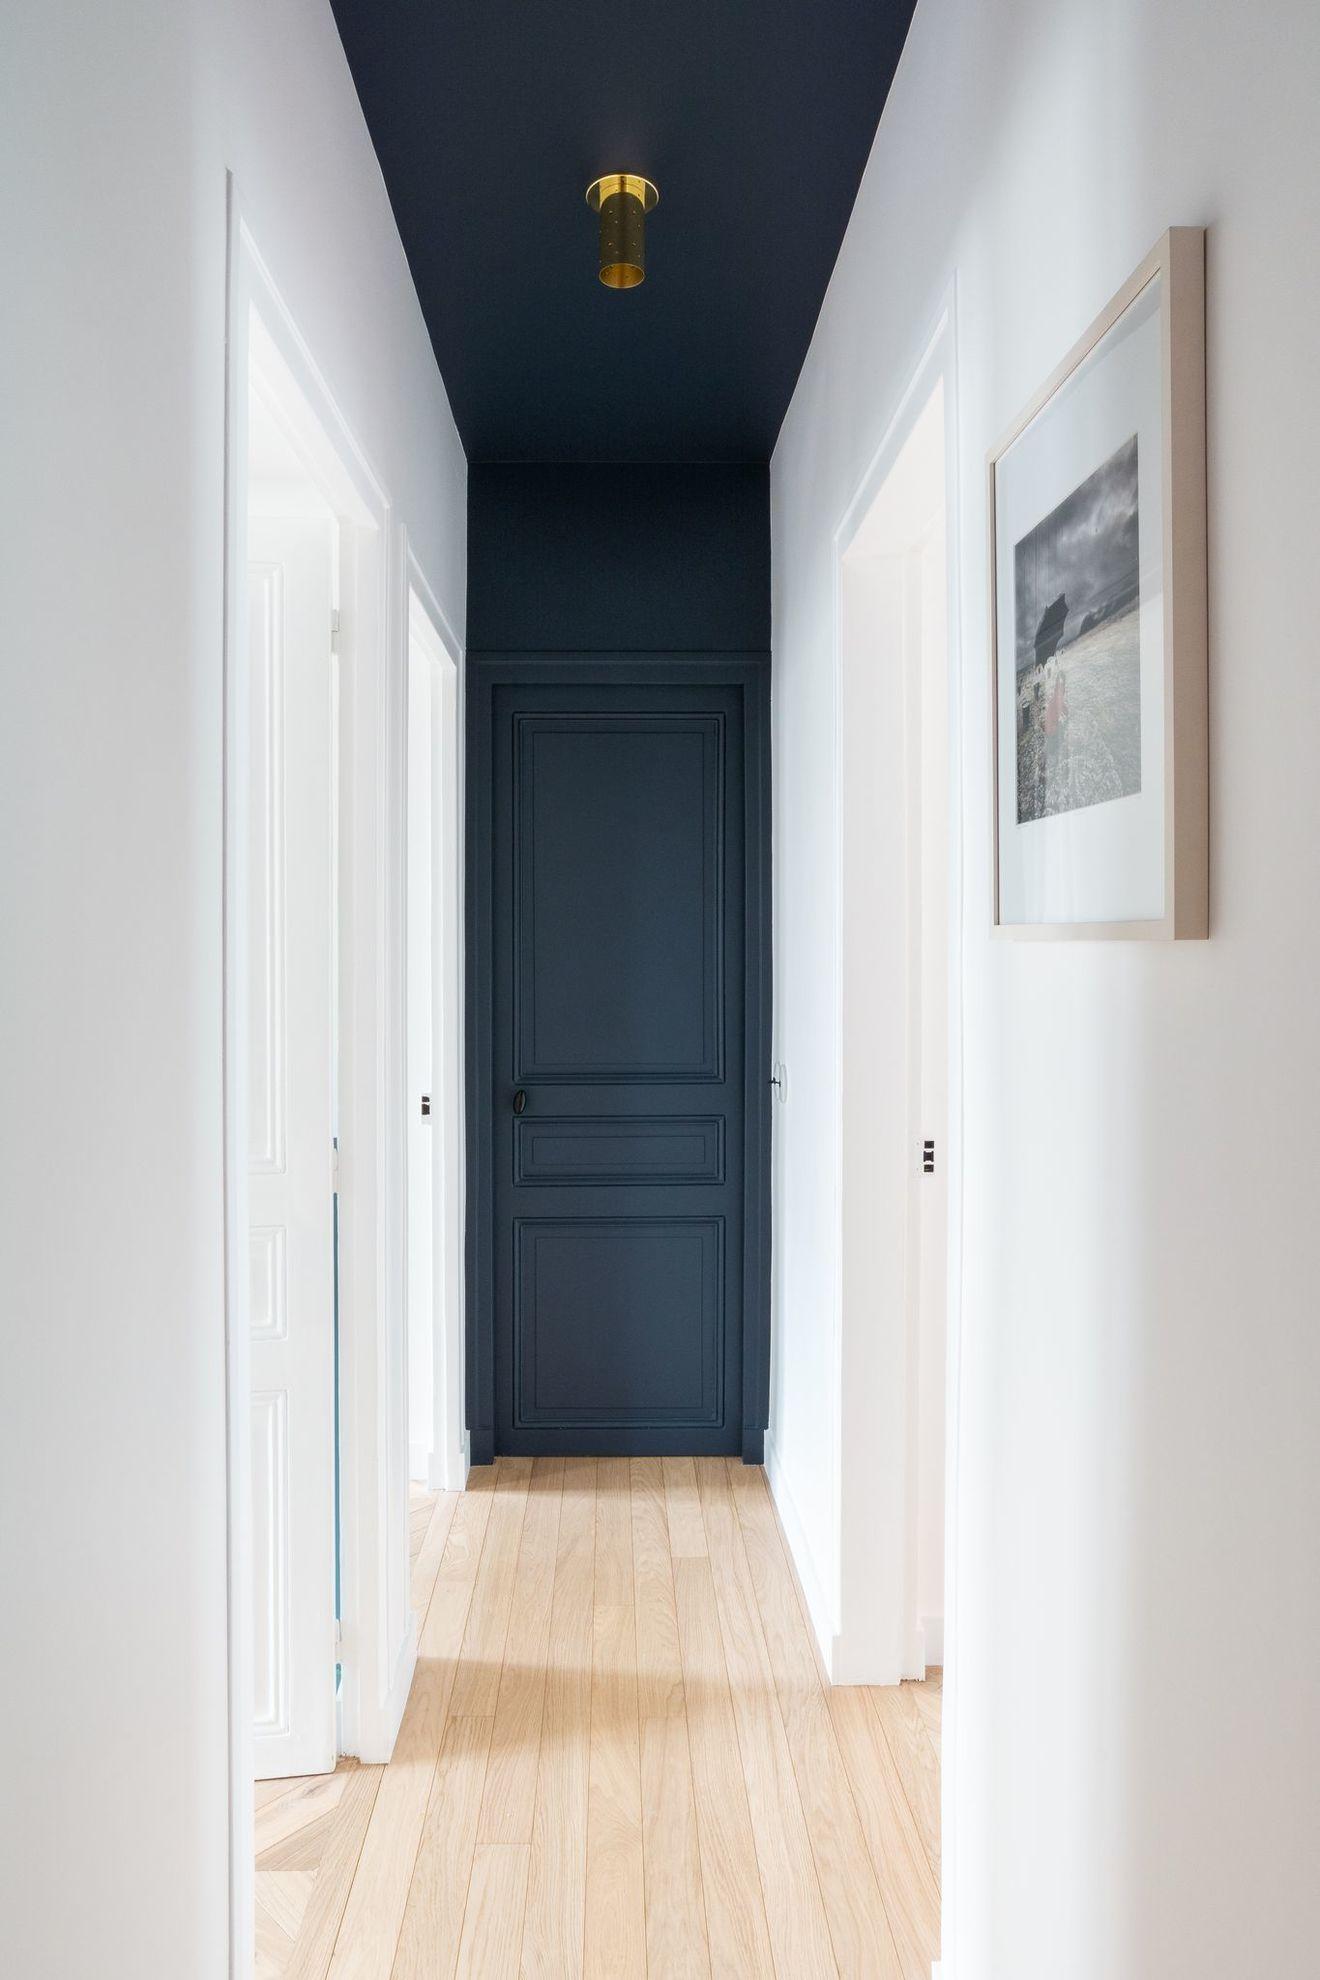 Appartement Neuilly sur Seine : un haussmannien modernisé en couleurs #houseinspiration